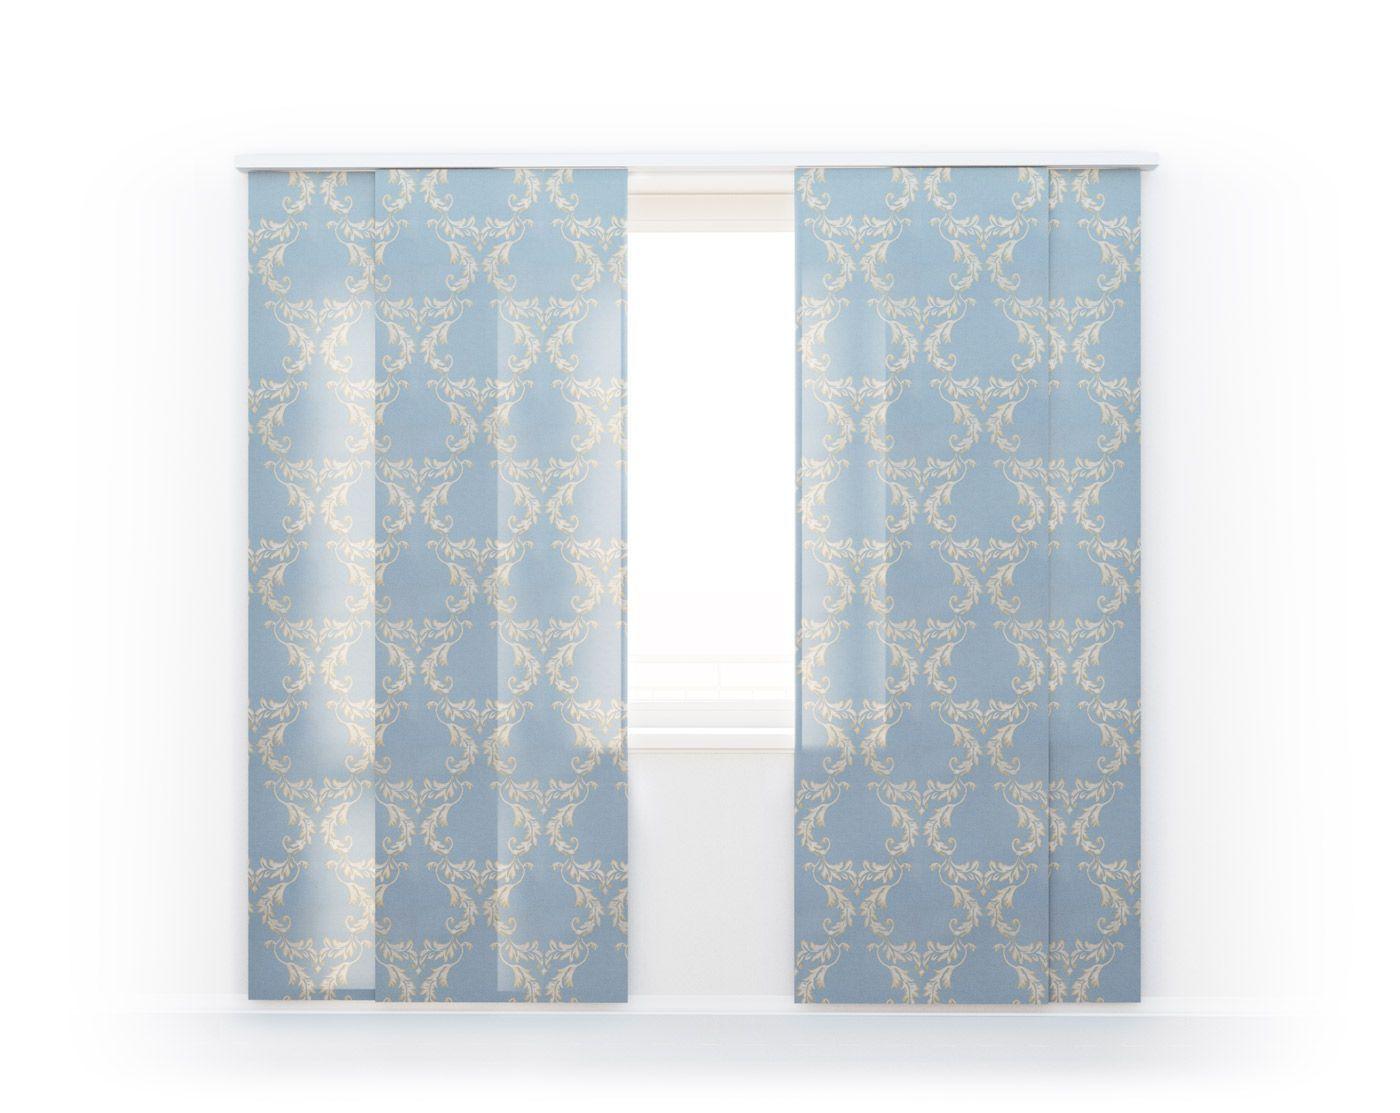 Японские шторы Louis D'or, 2375/41